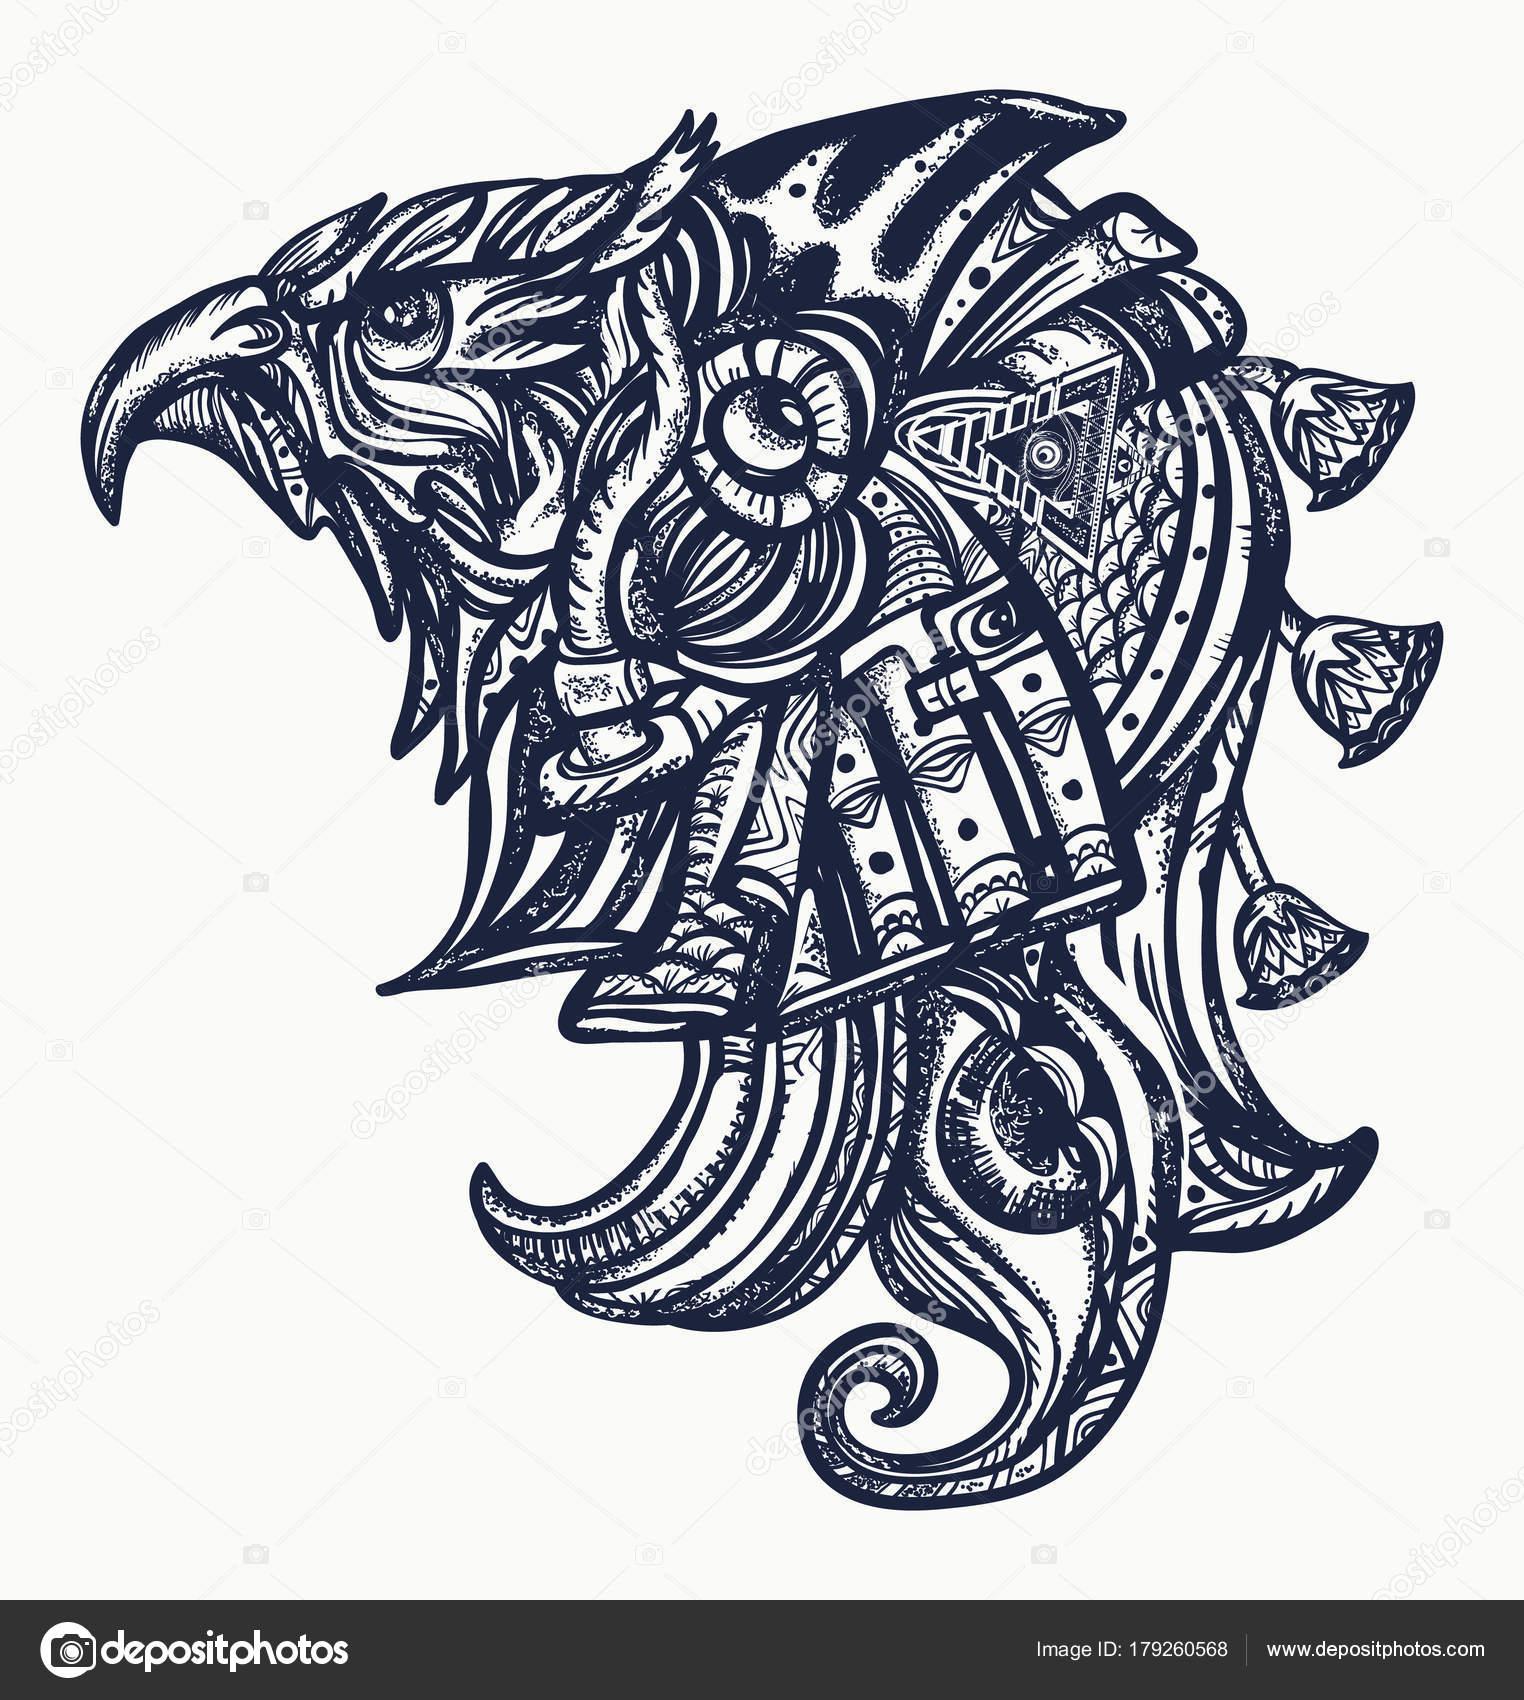 07bdb4bef Ancient Egypt tattoo and t-shirt design.Horus gods, eye of Ra, symbol of  ancient civilization. Horus head tattoo art — Vector by intueri